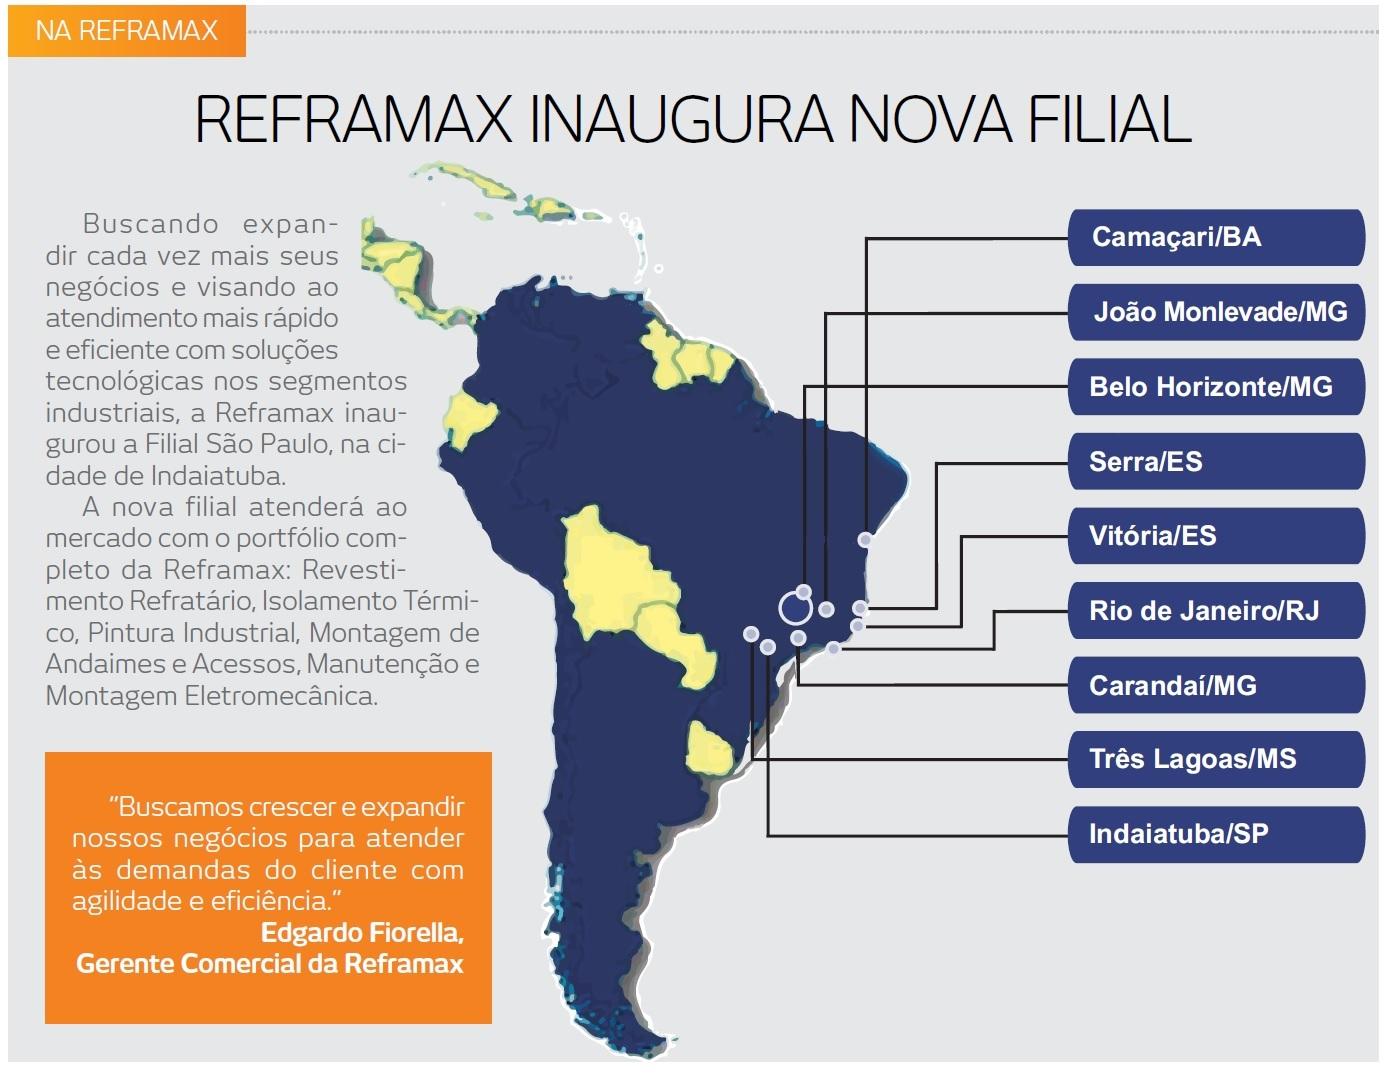 REFRAMAX INAUGURA NOVA FILIAL